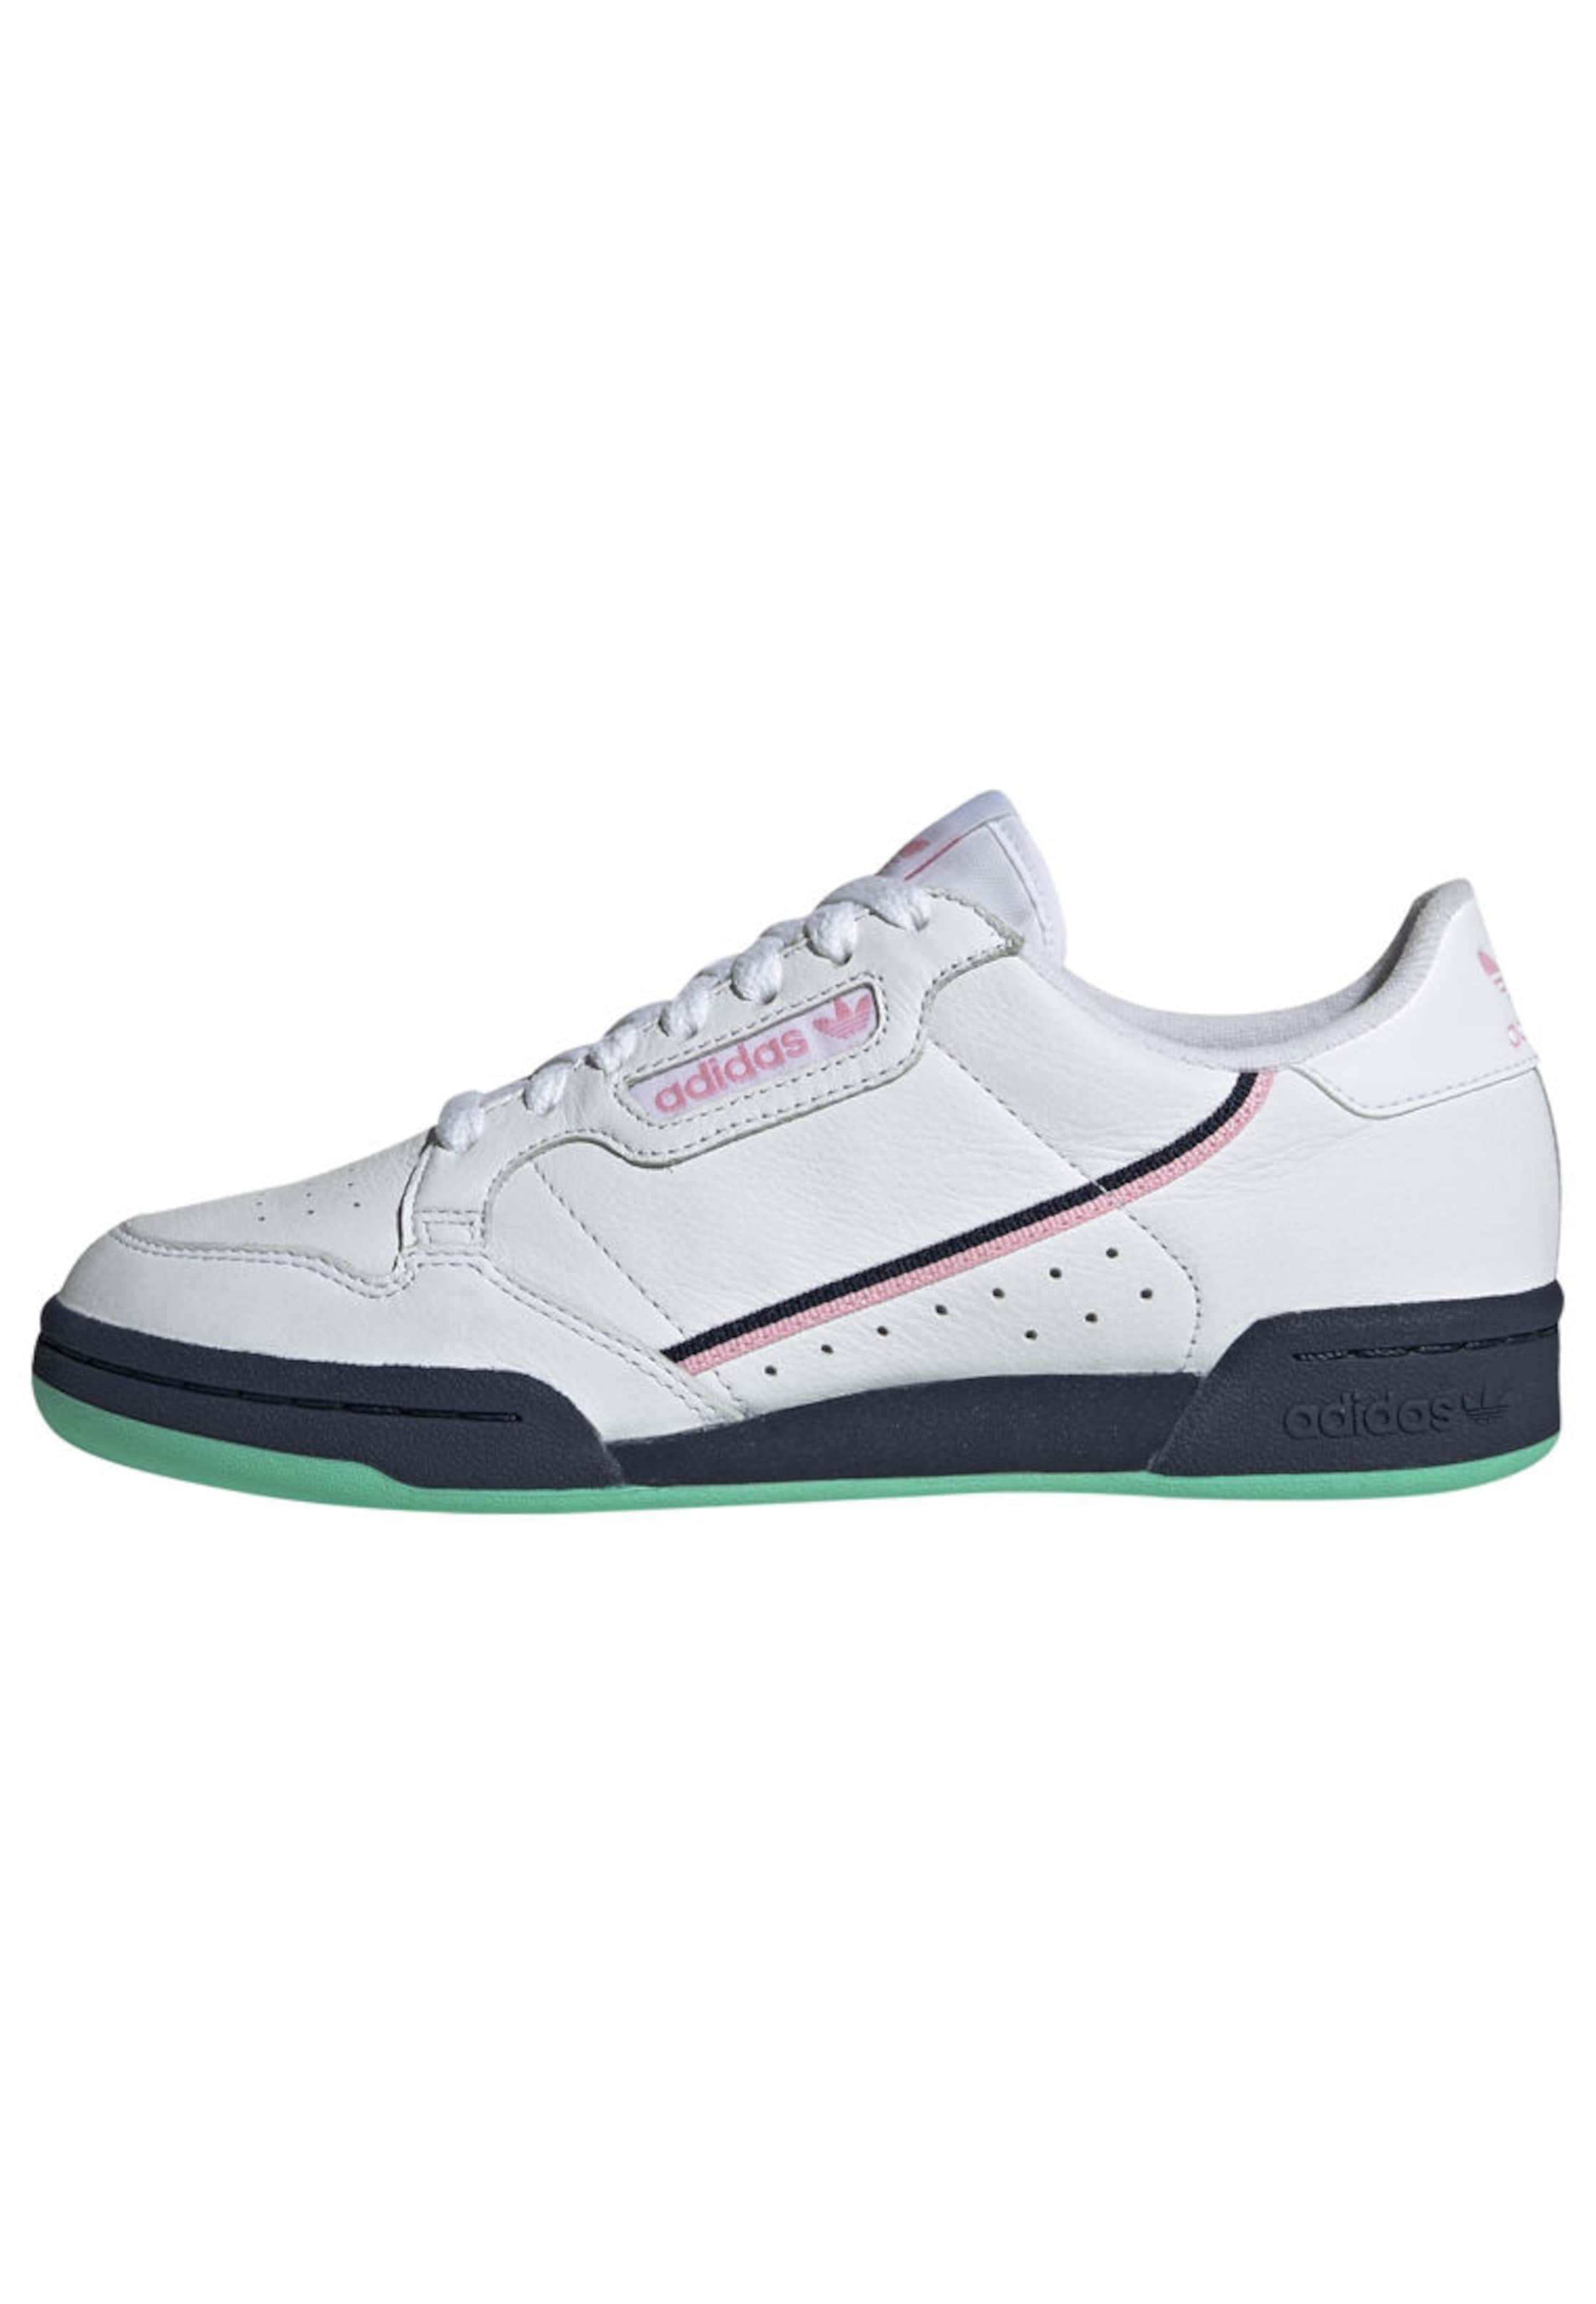 Adidas Originals 80' Blanc Basses 'continental Rose ClairNoir En Baskets 5AjL3R4